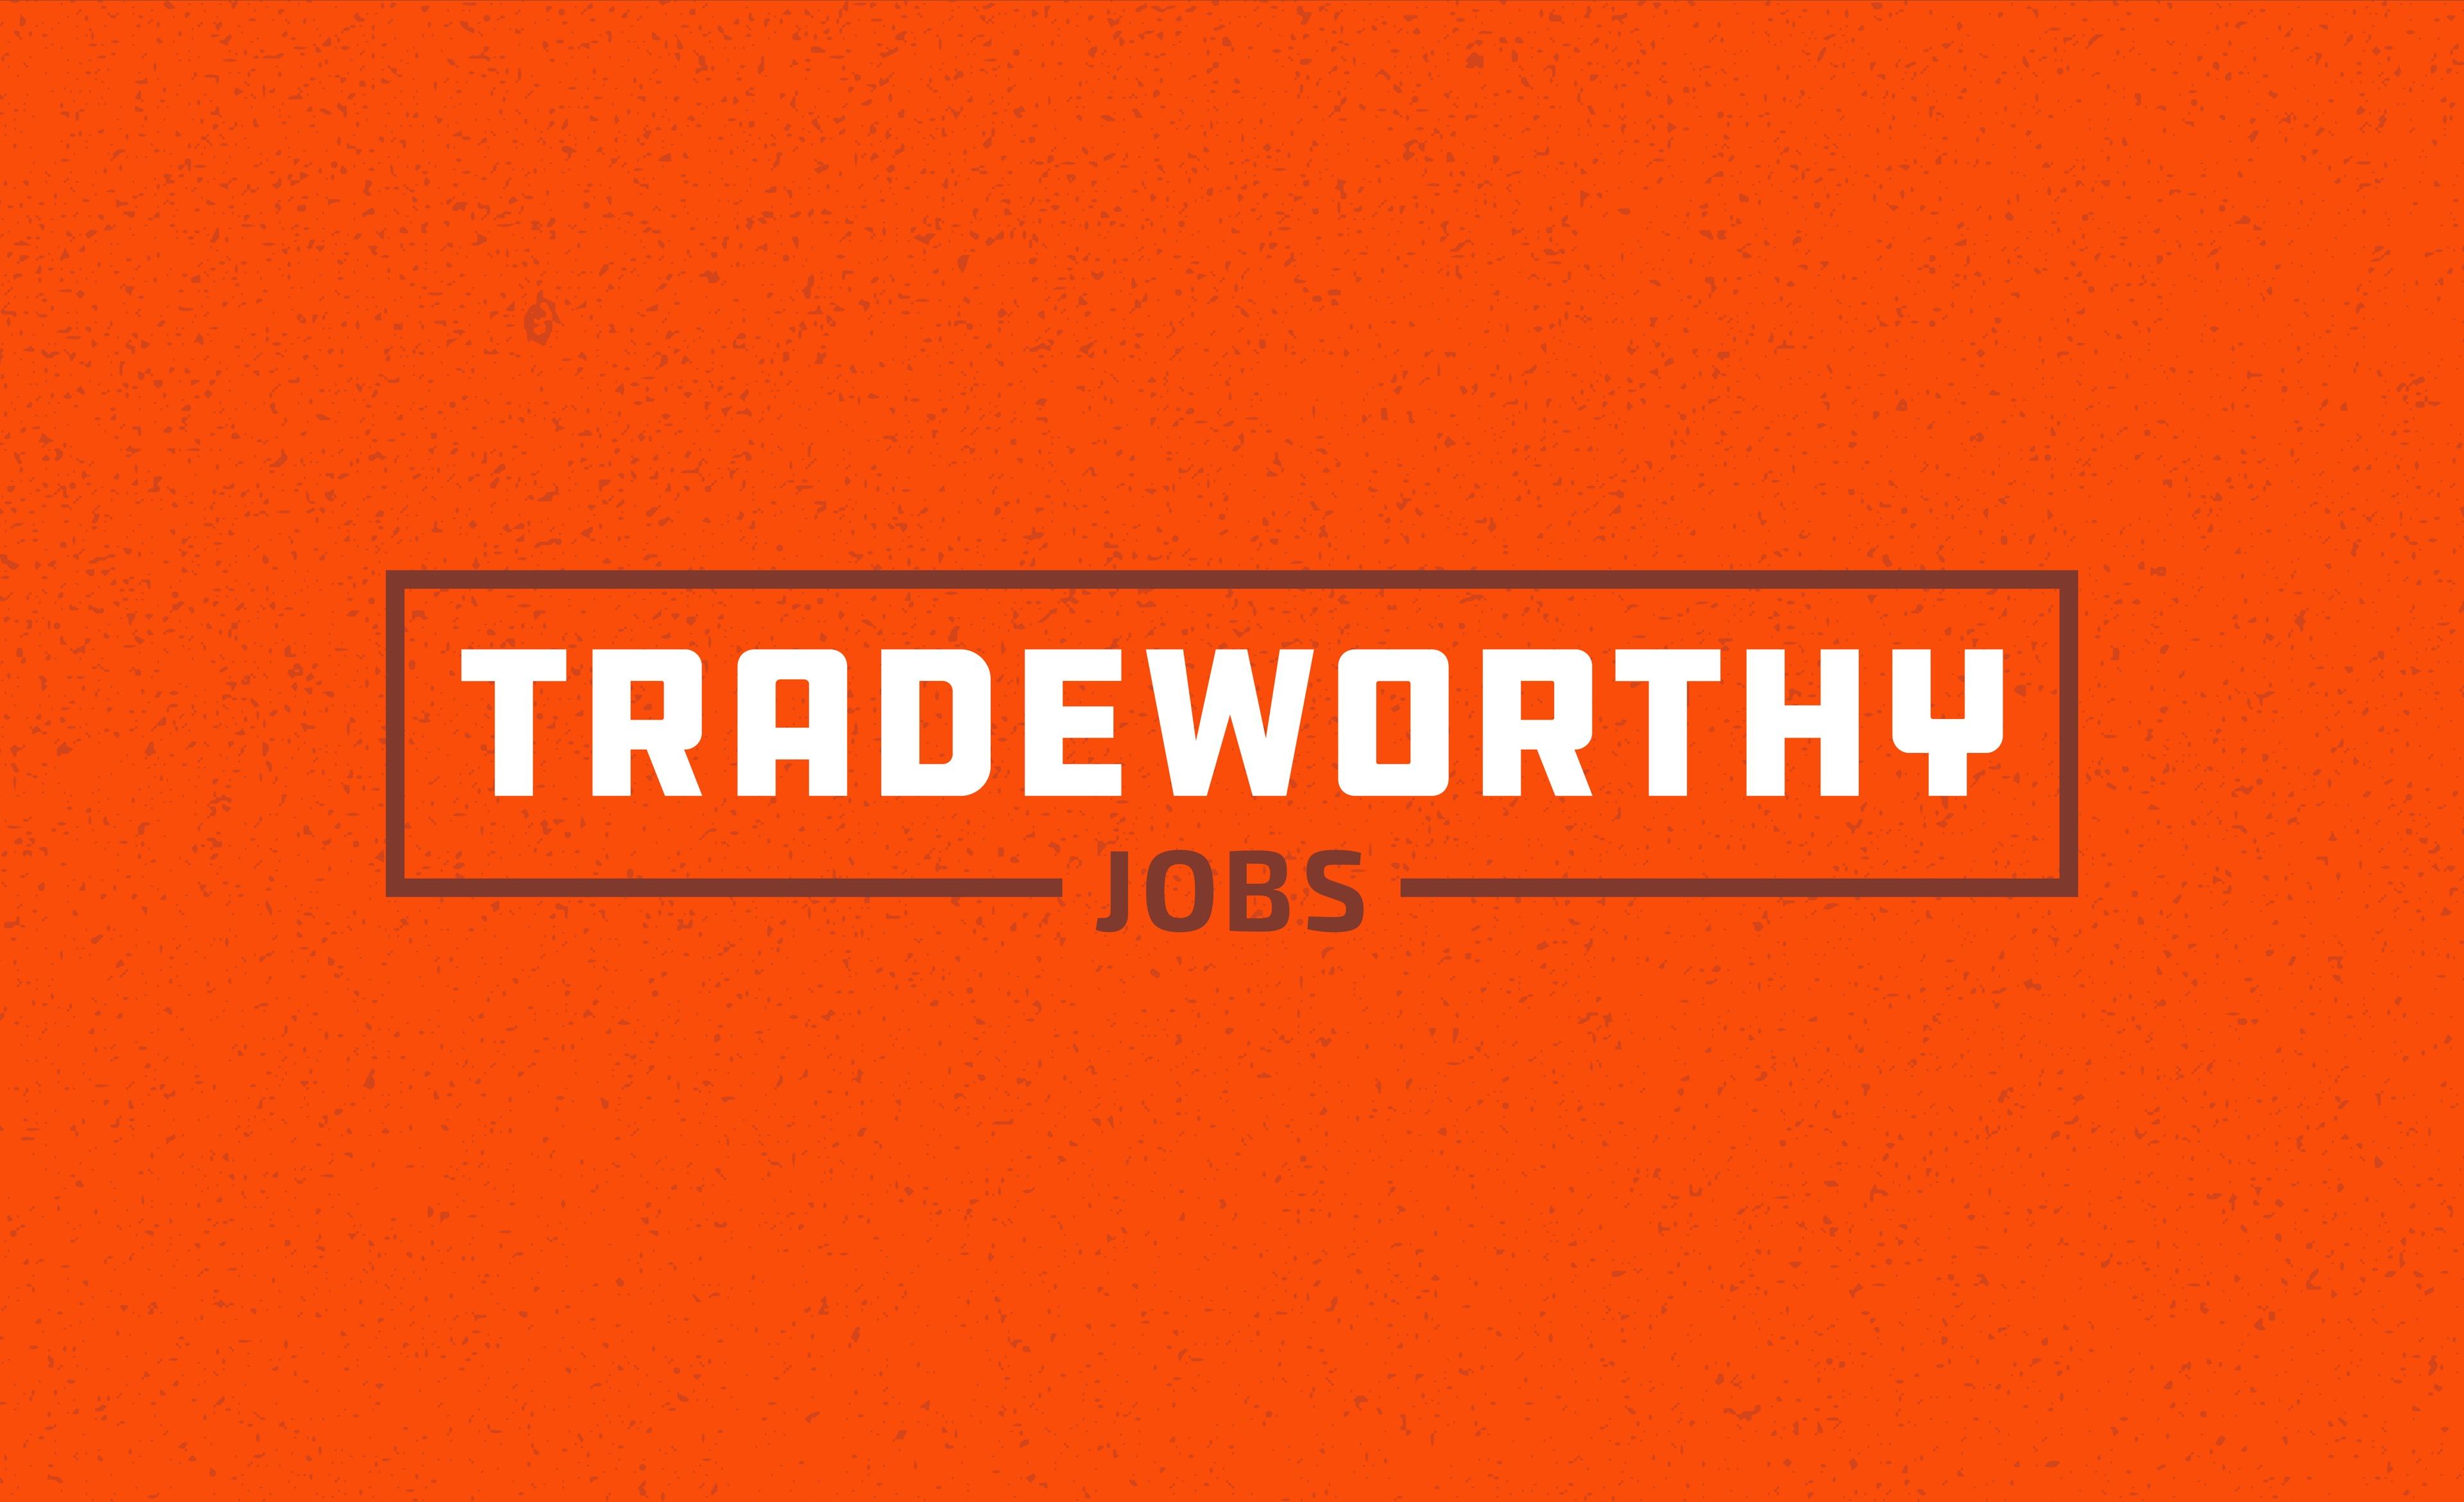 The Tradeworthy Jobs logo on an orange background.